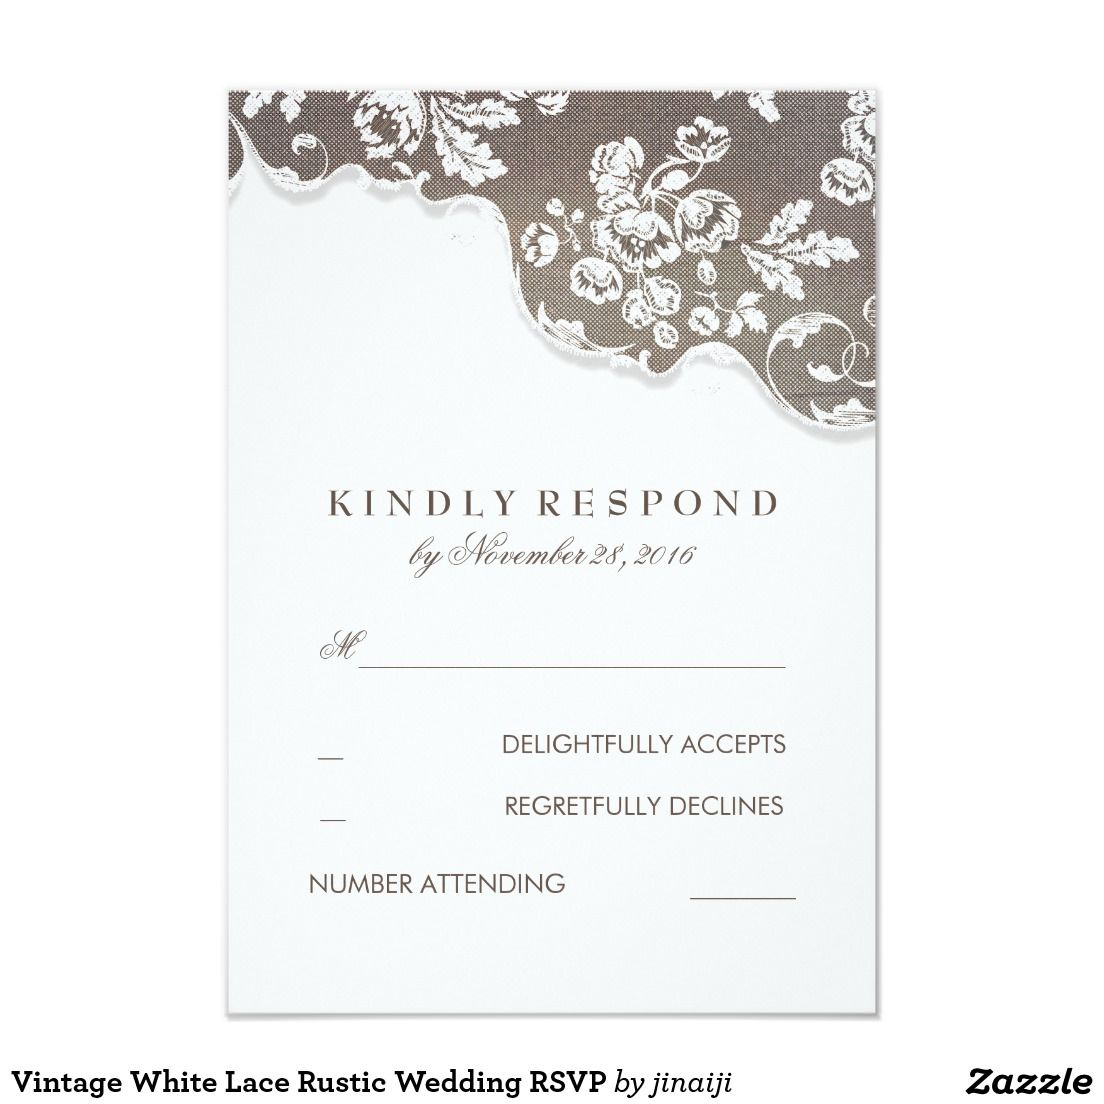 Vintage White Lace Rustic Wedding RSVP Card | Wedding rsvp, Rsvp and ...